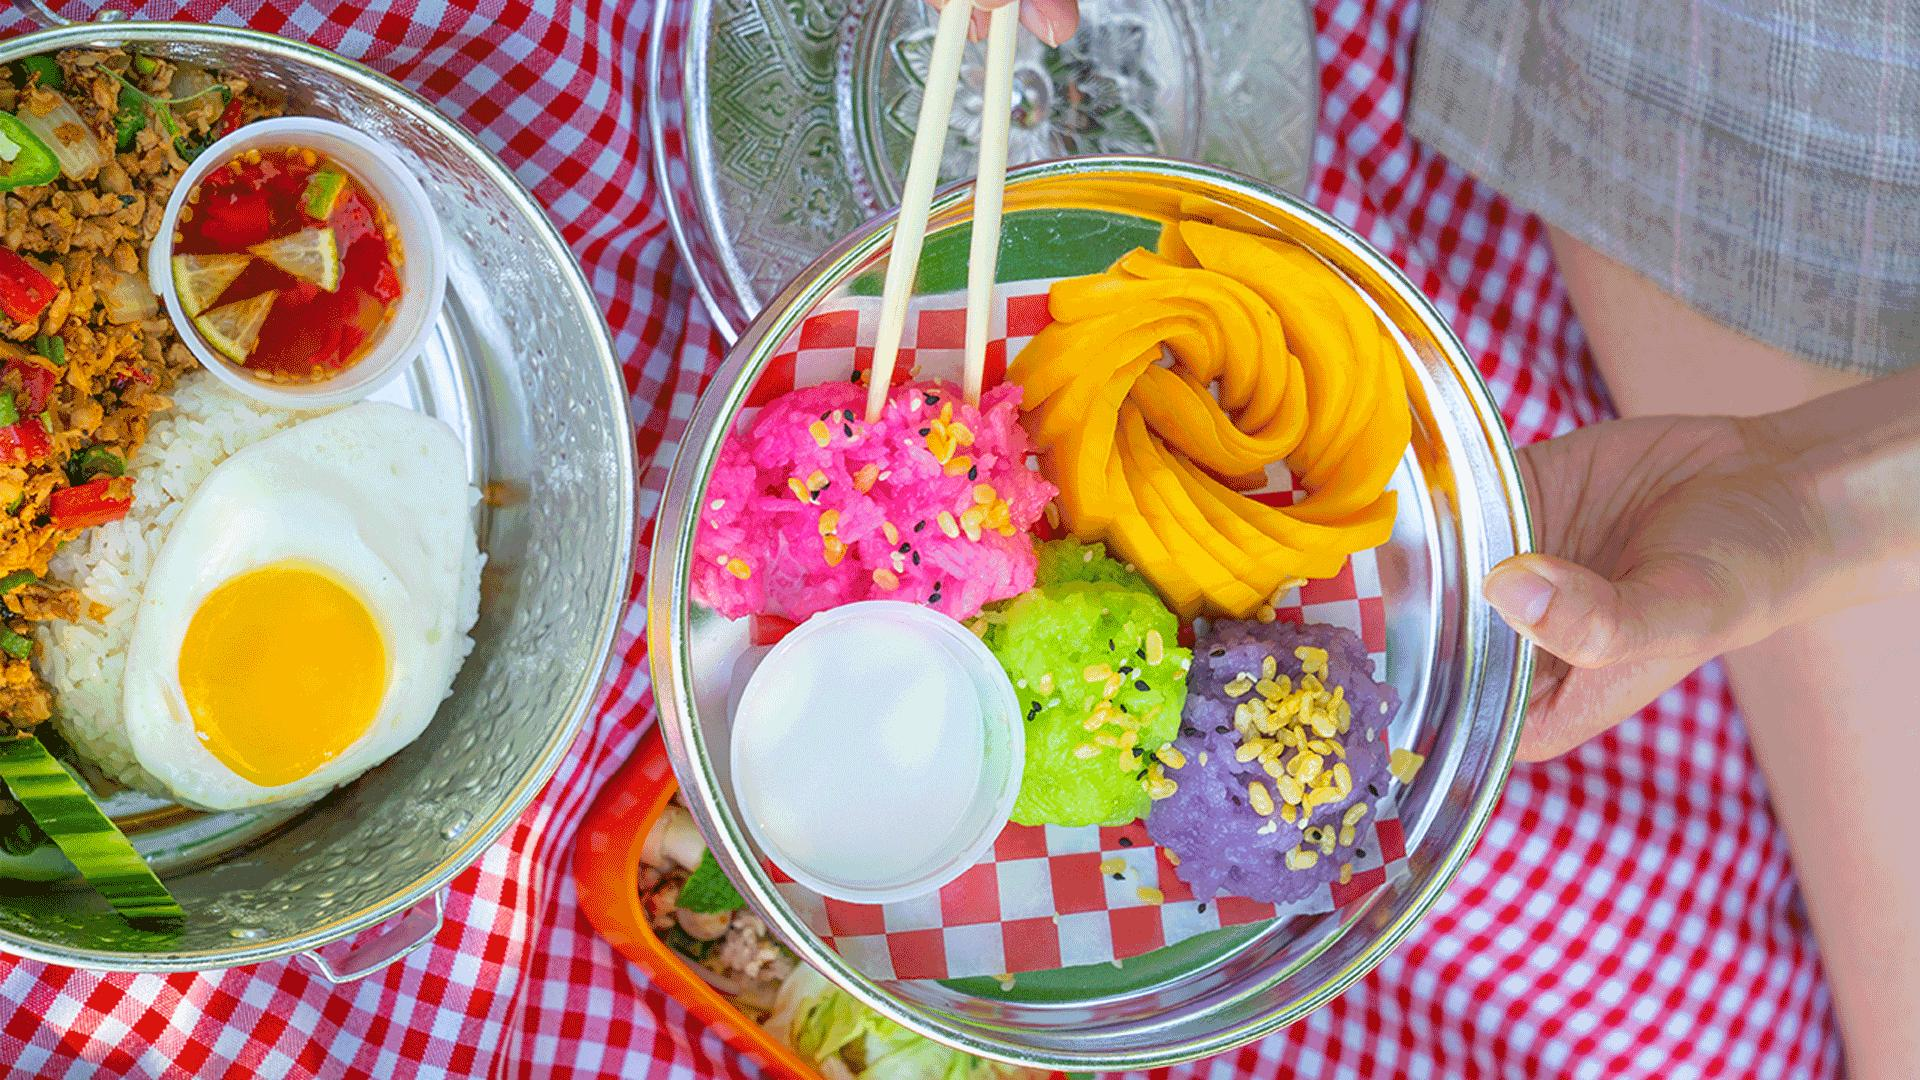 Must-try picnic baskets from Toronto restaurants   Mango sticky rice from Jatujak